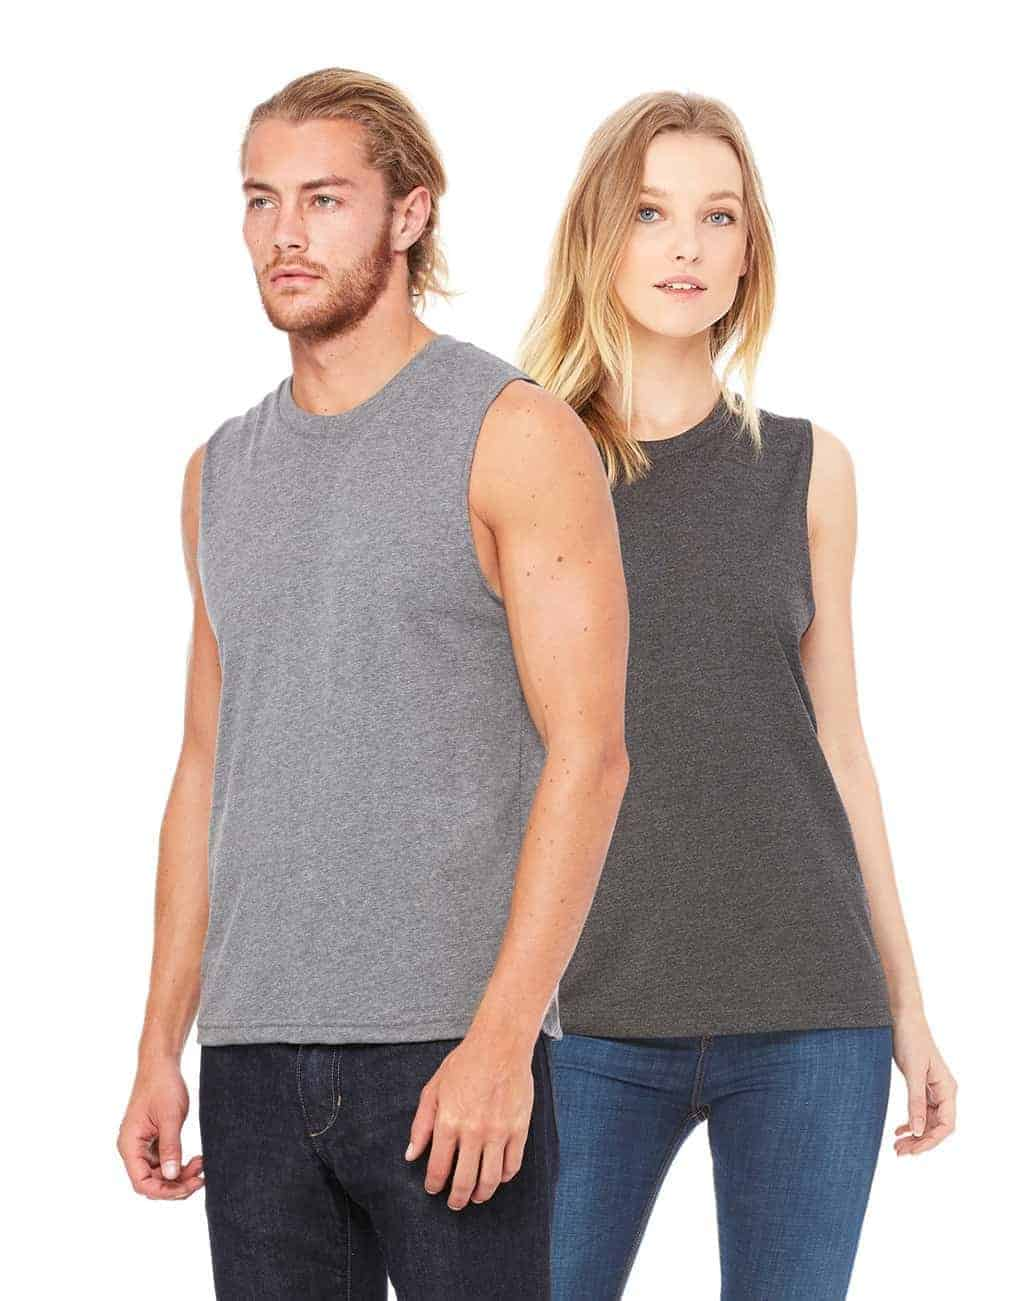 Design your own t-shirt bella - Custom Muscle Tank Tops Unisex Bella Canvas